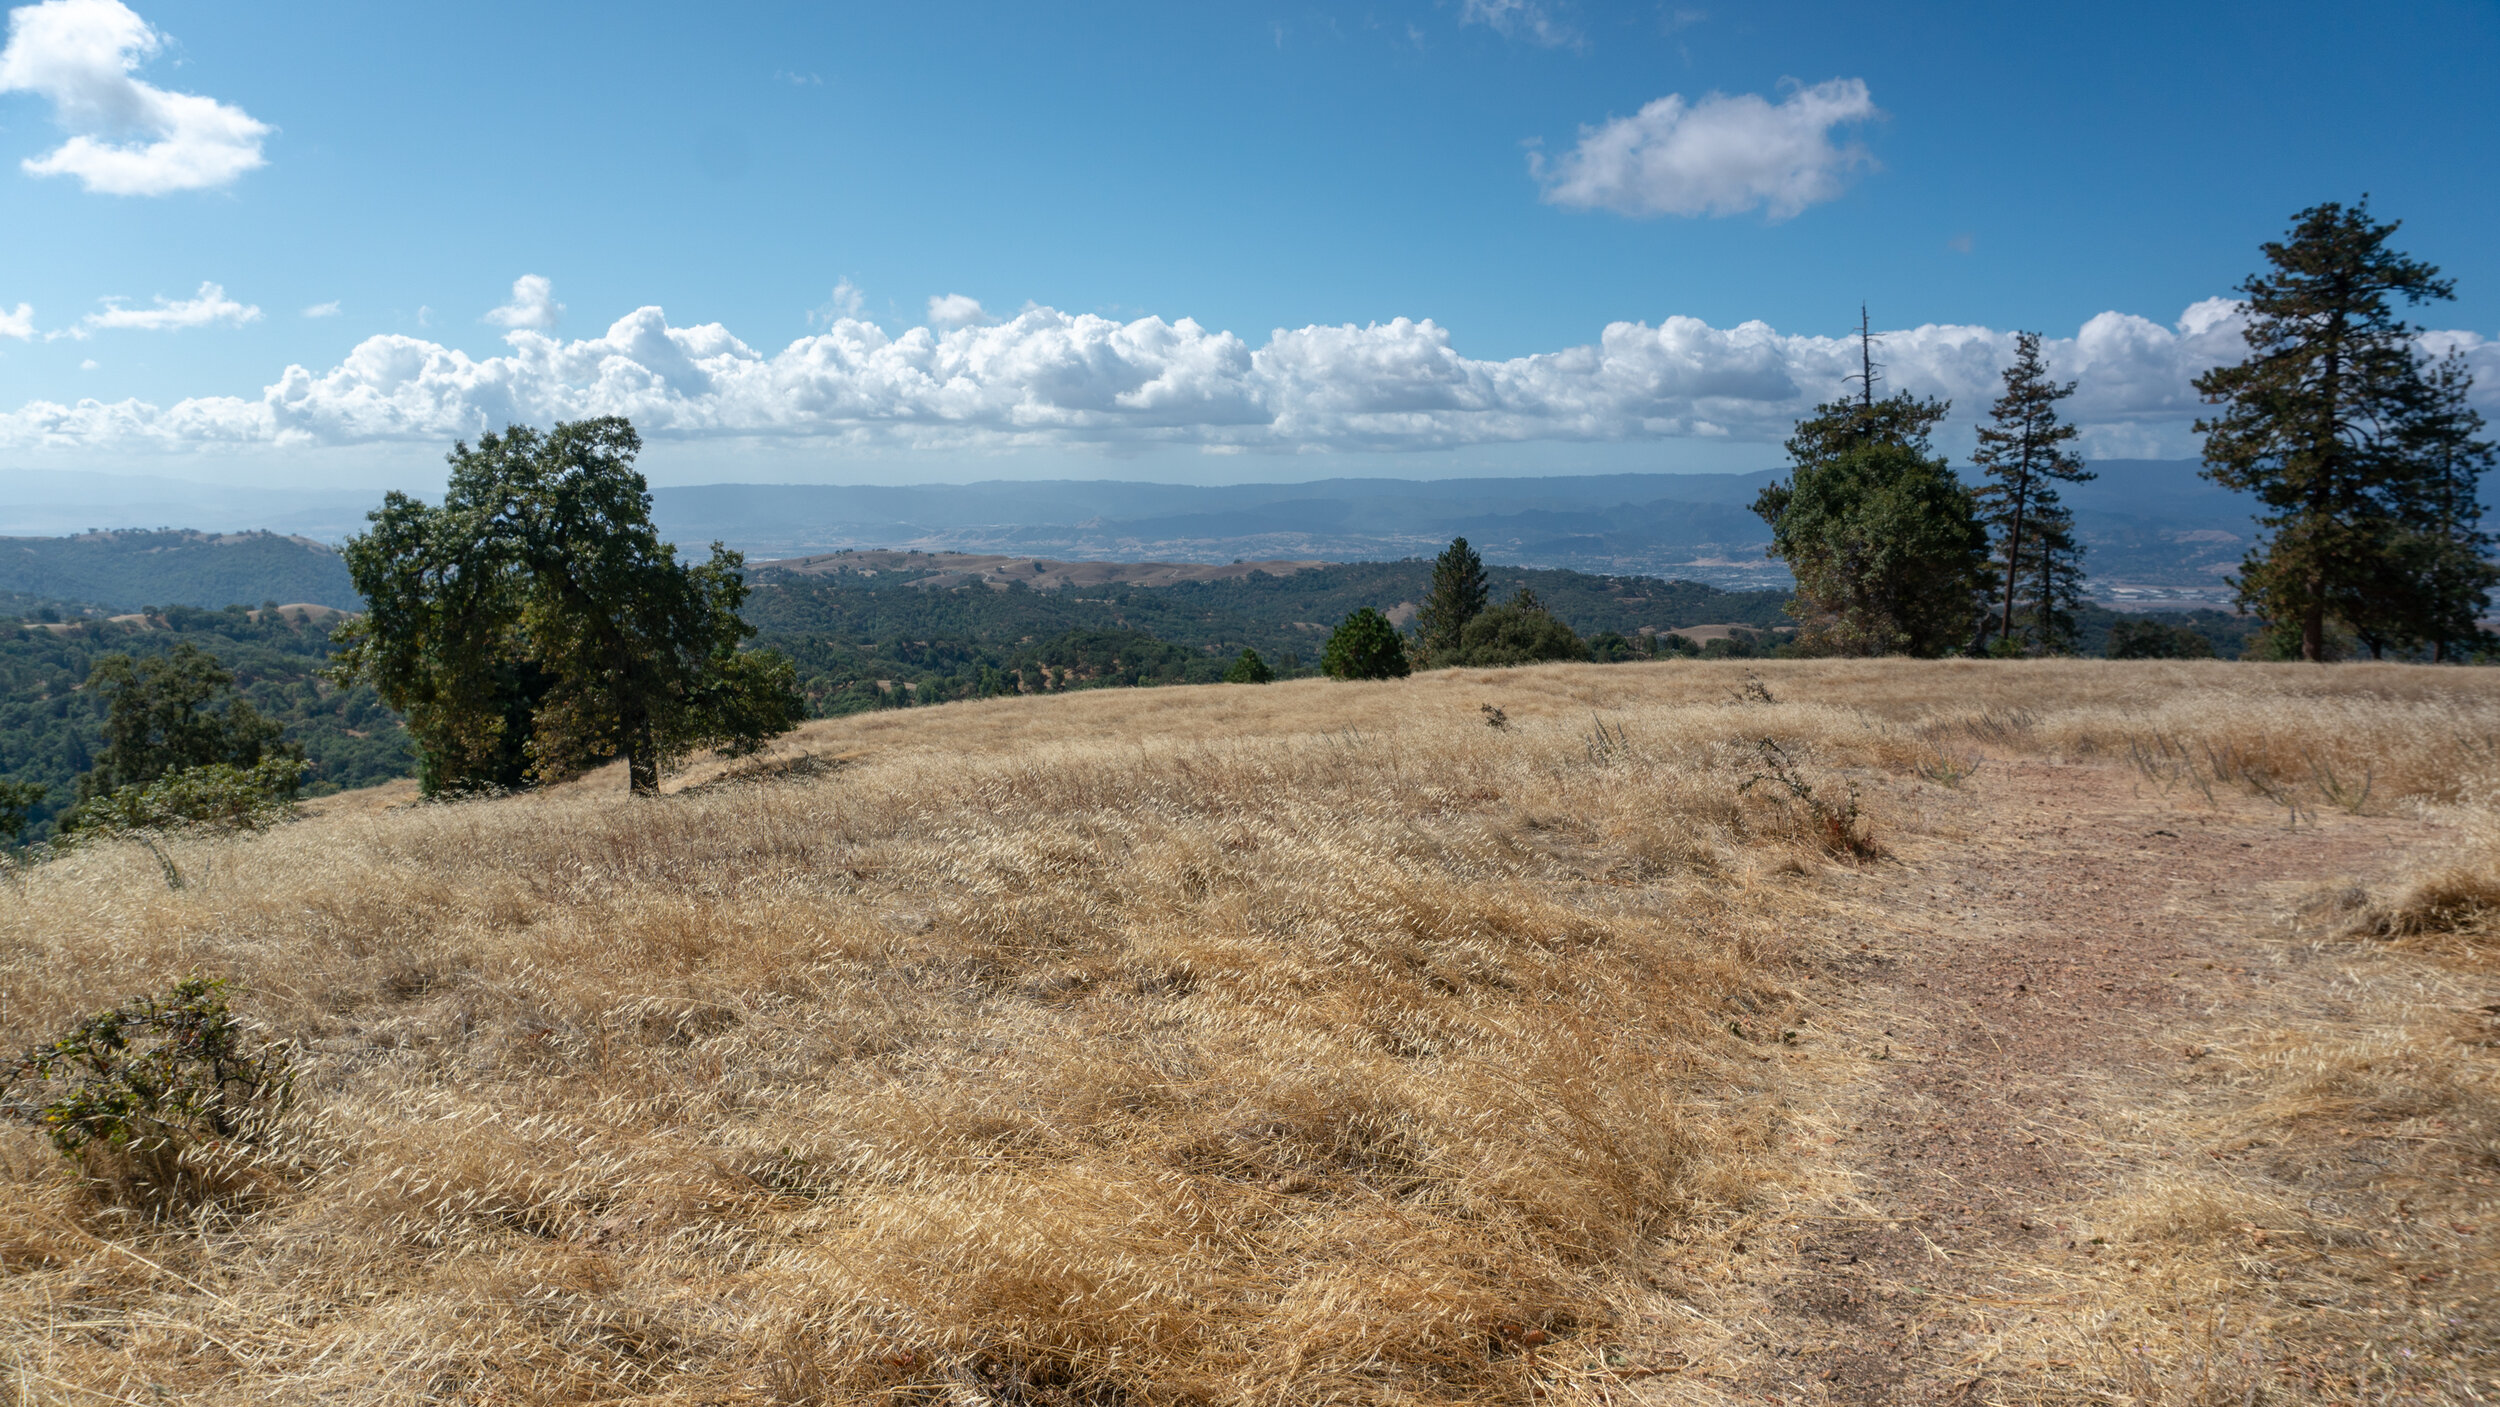 View of the Santa Clara Valley and Santa Cruz Mountains from Pine Ridge